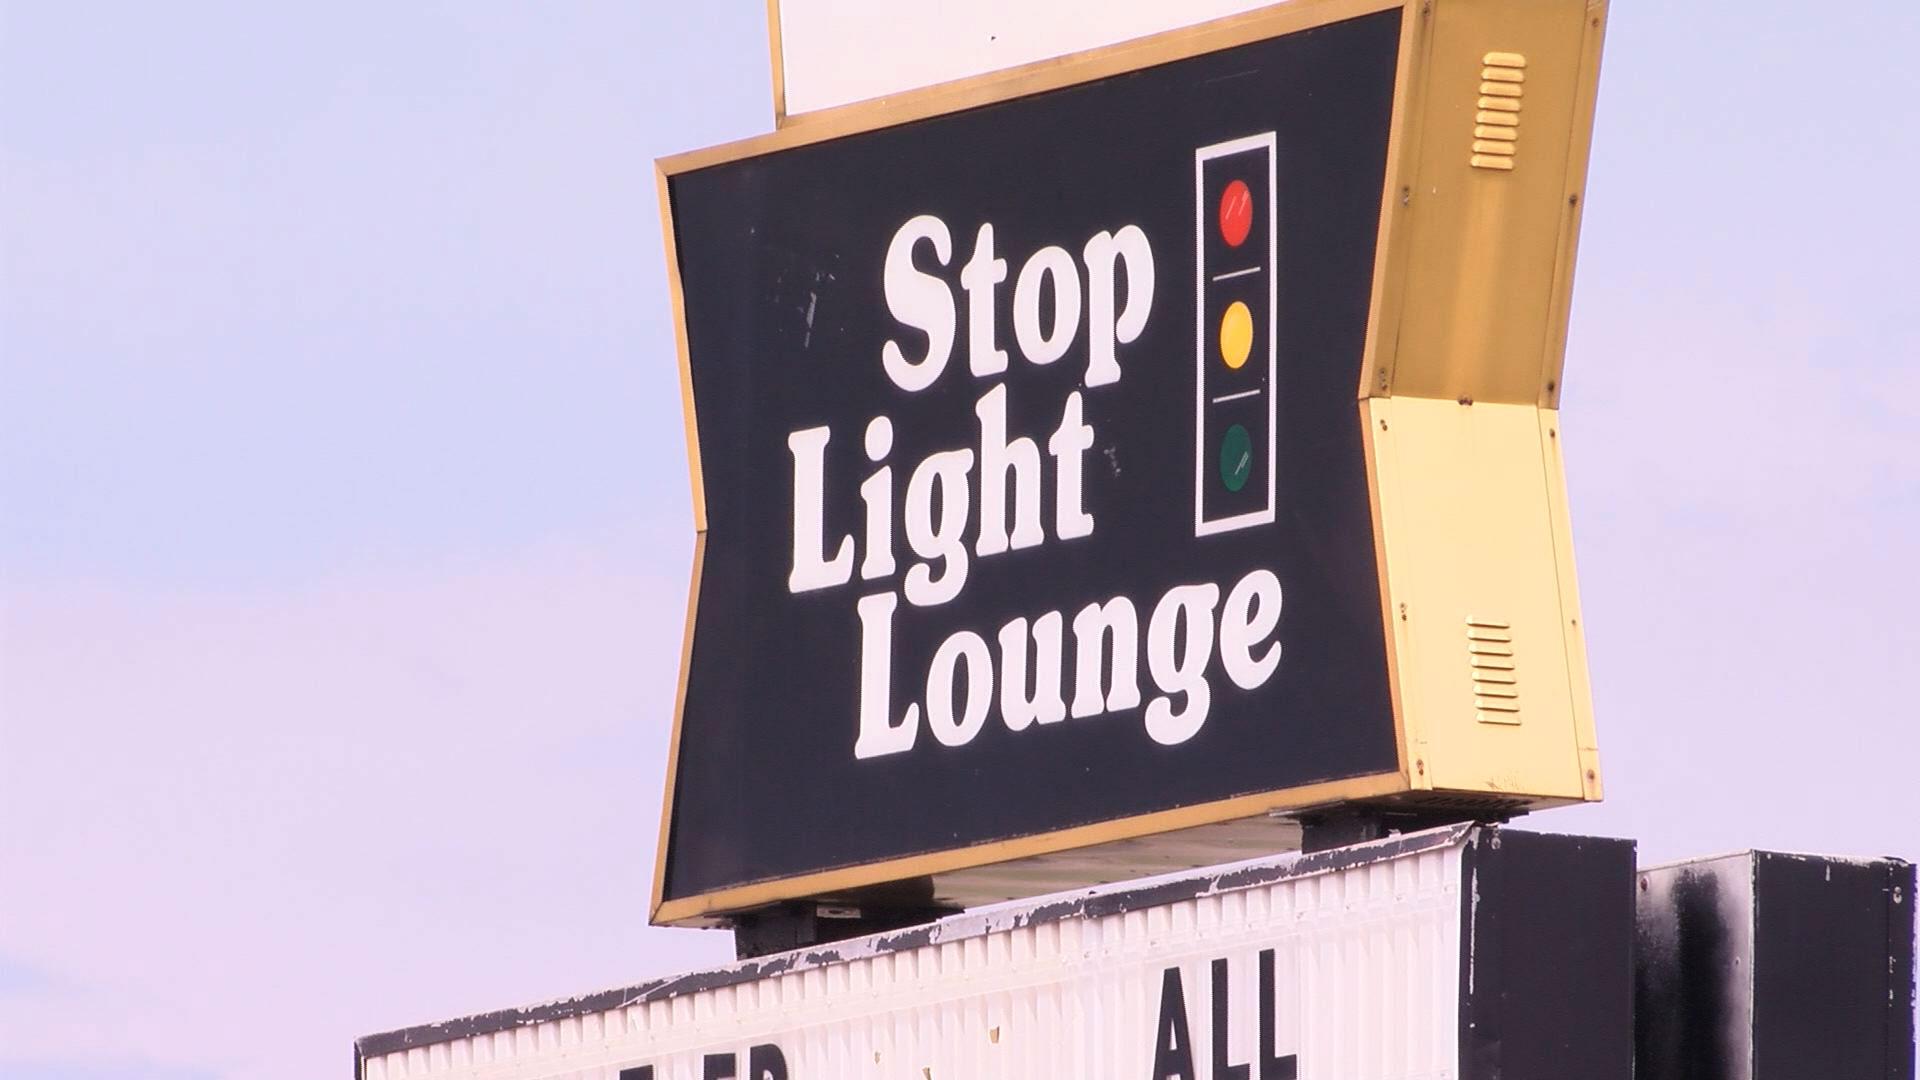 KELO Stop Light Lounge